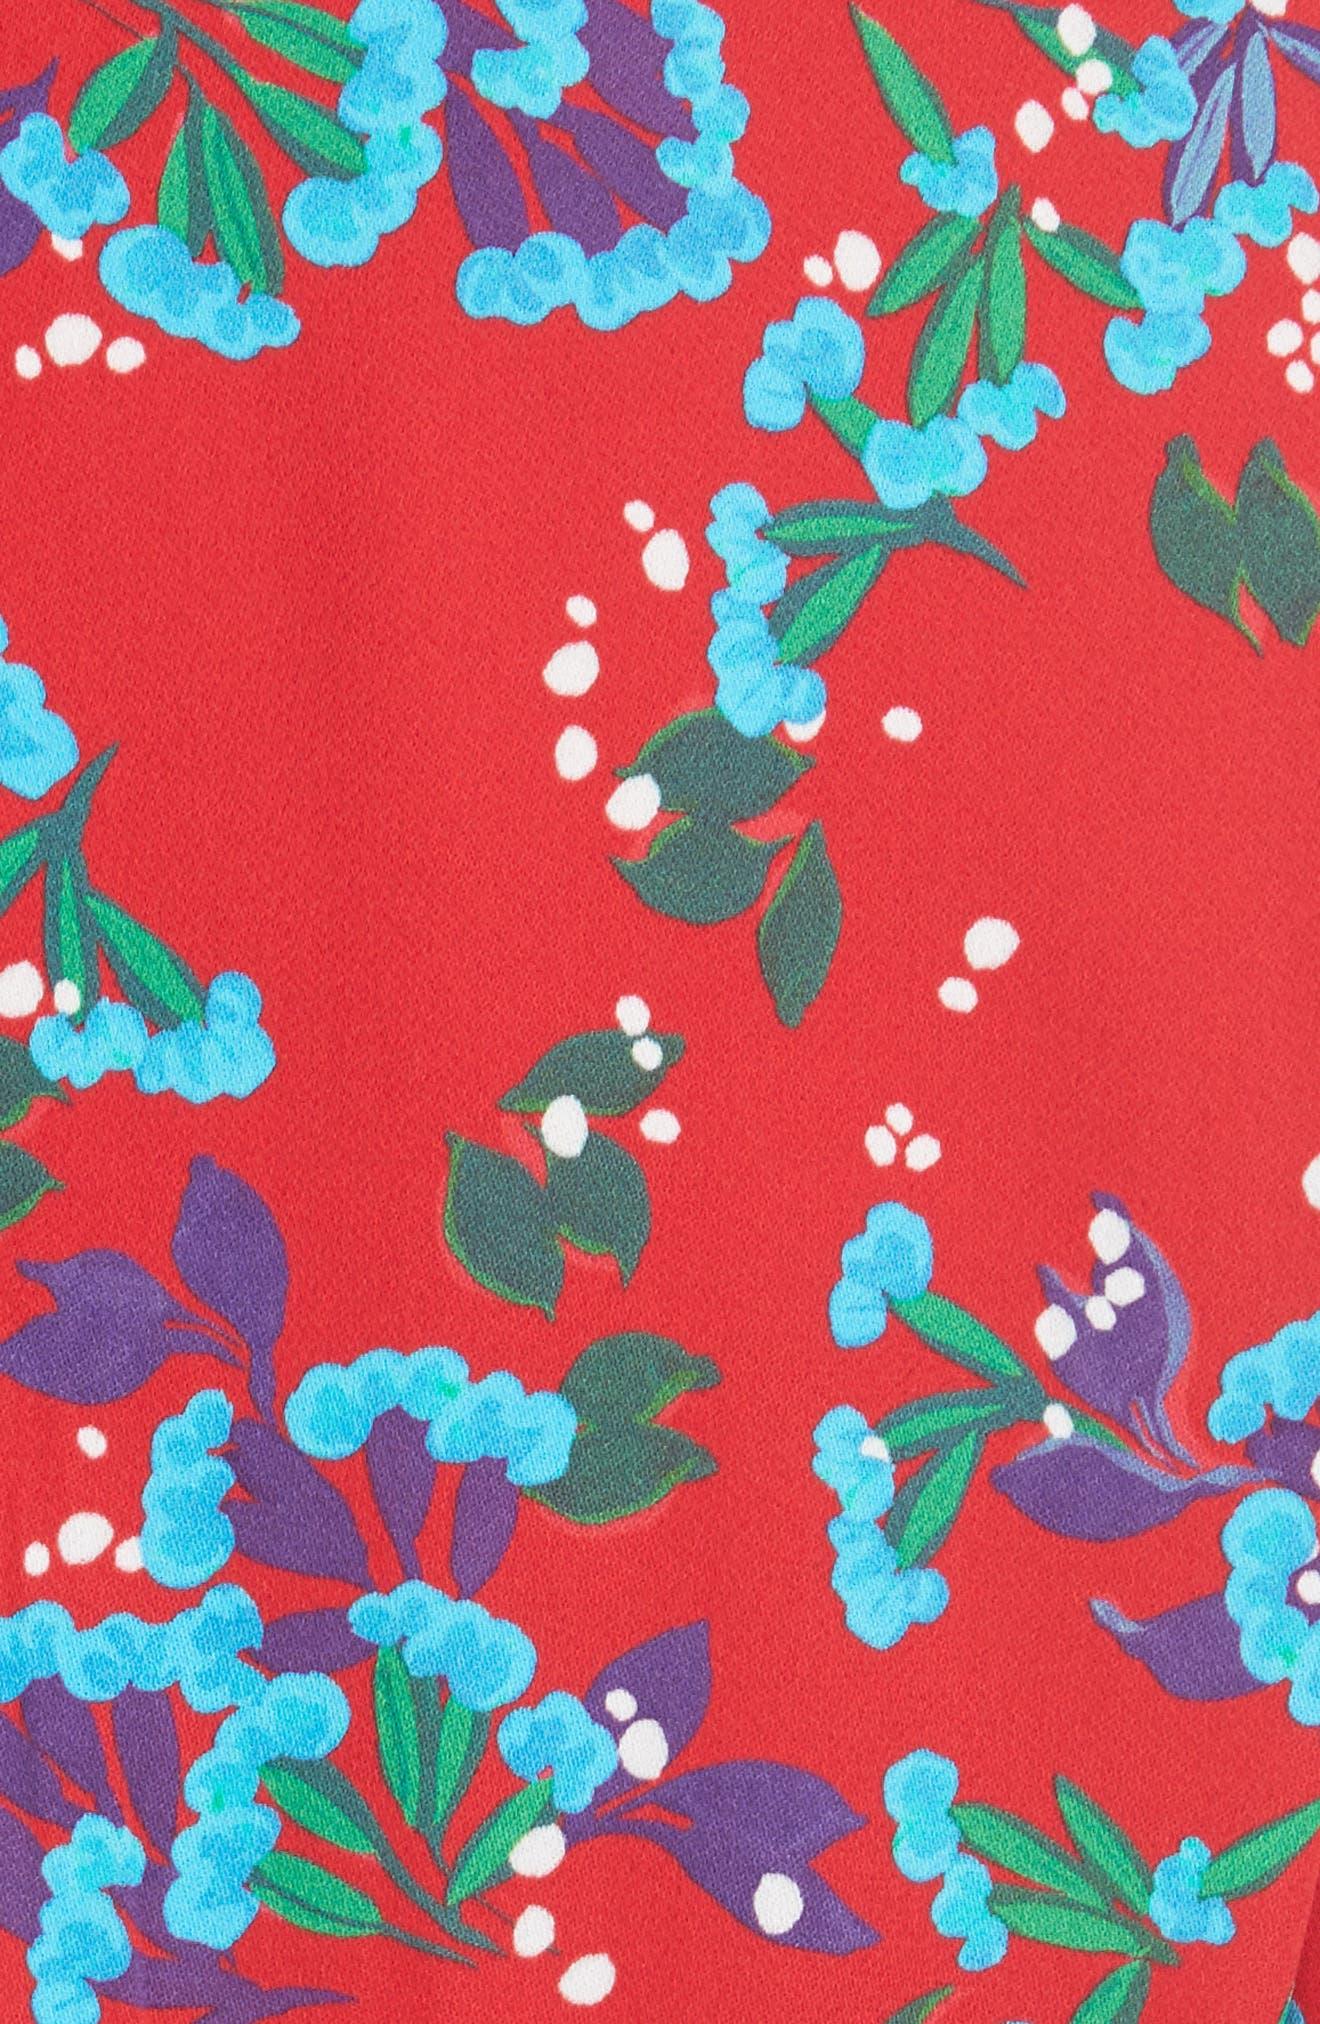 Eve Floral Print Dress,                             Alternate thumbnail 5, color,                             SCARLET SWEETPEAS